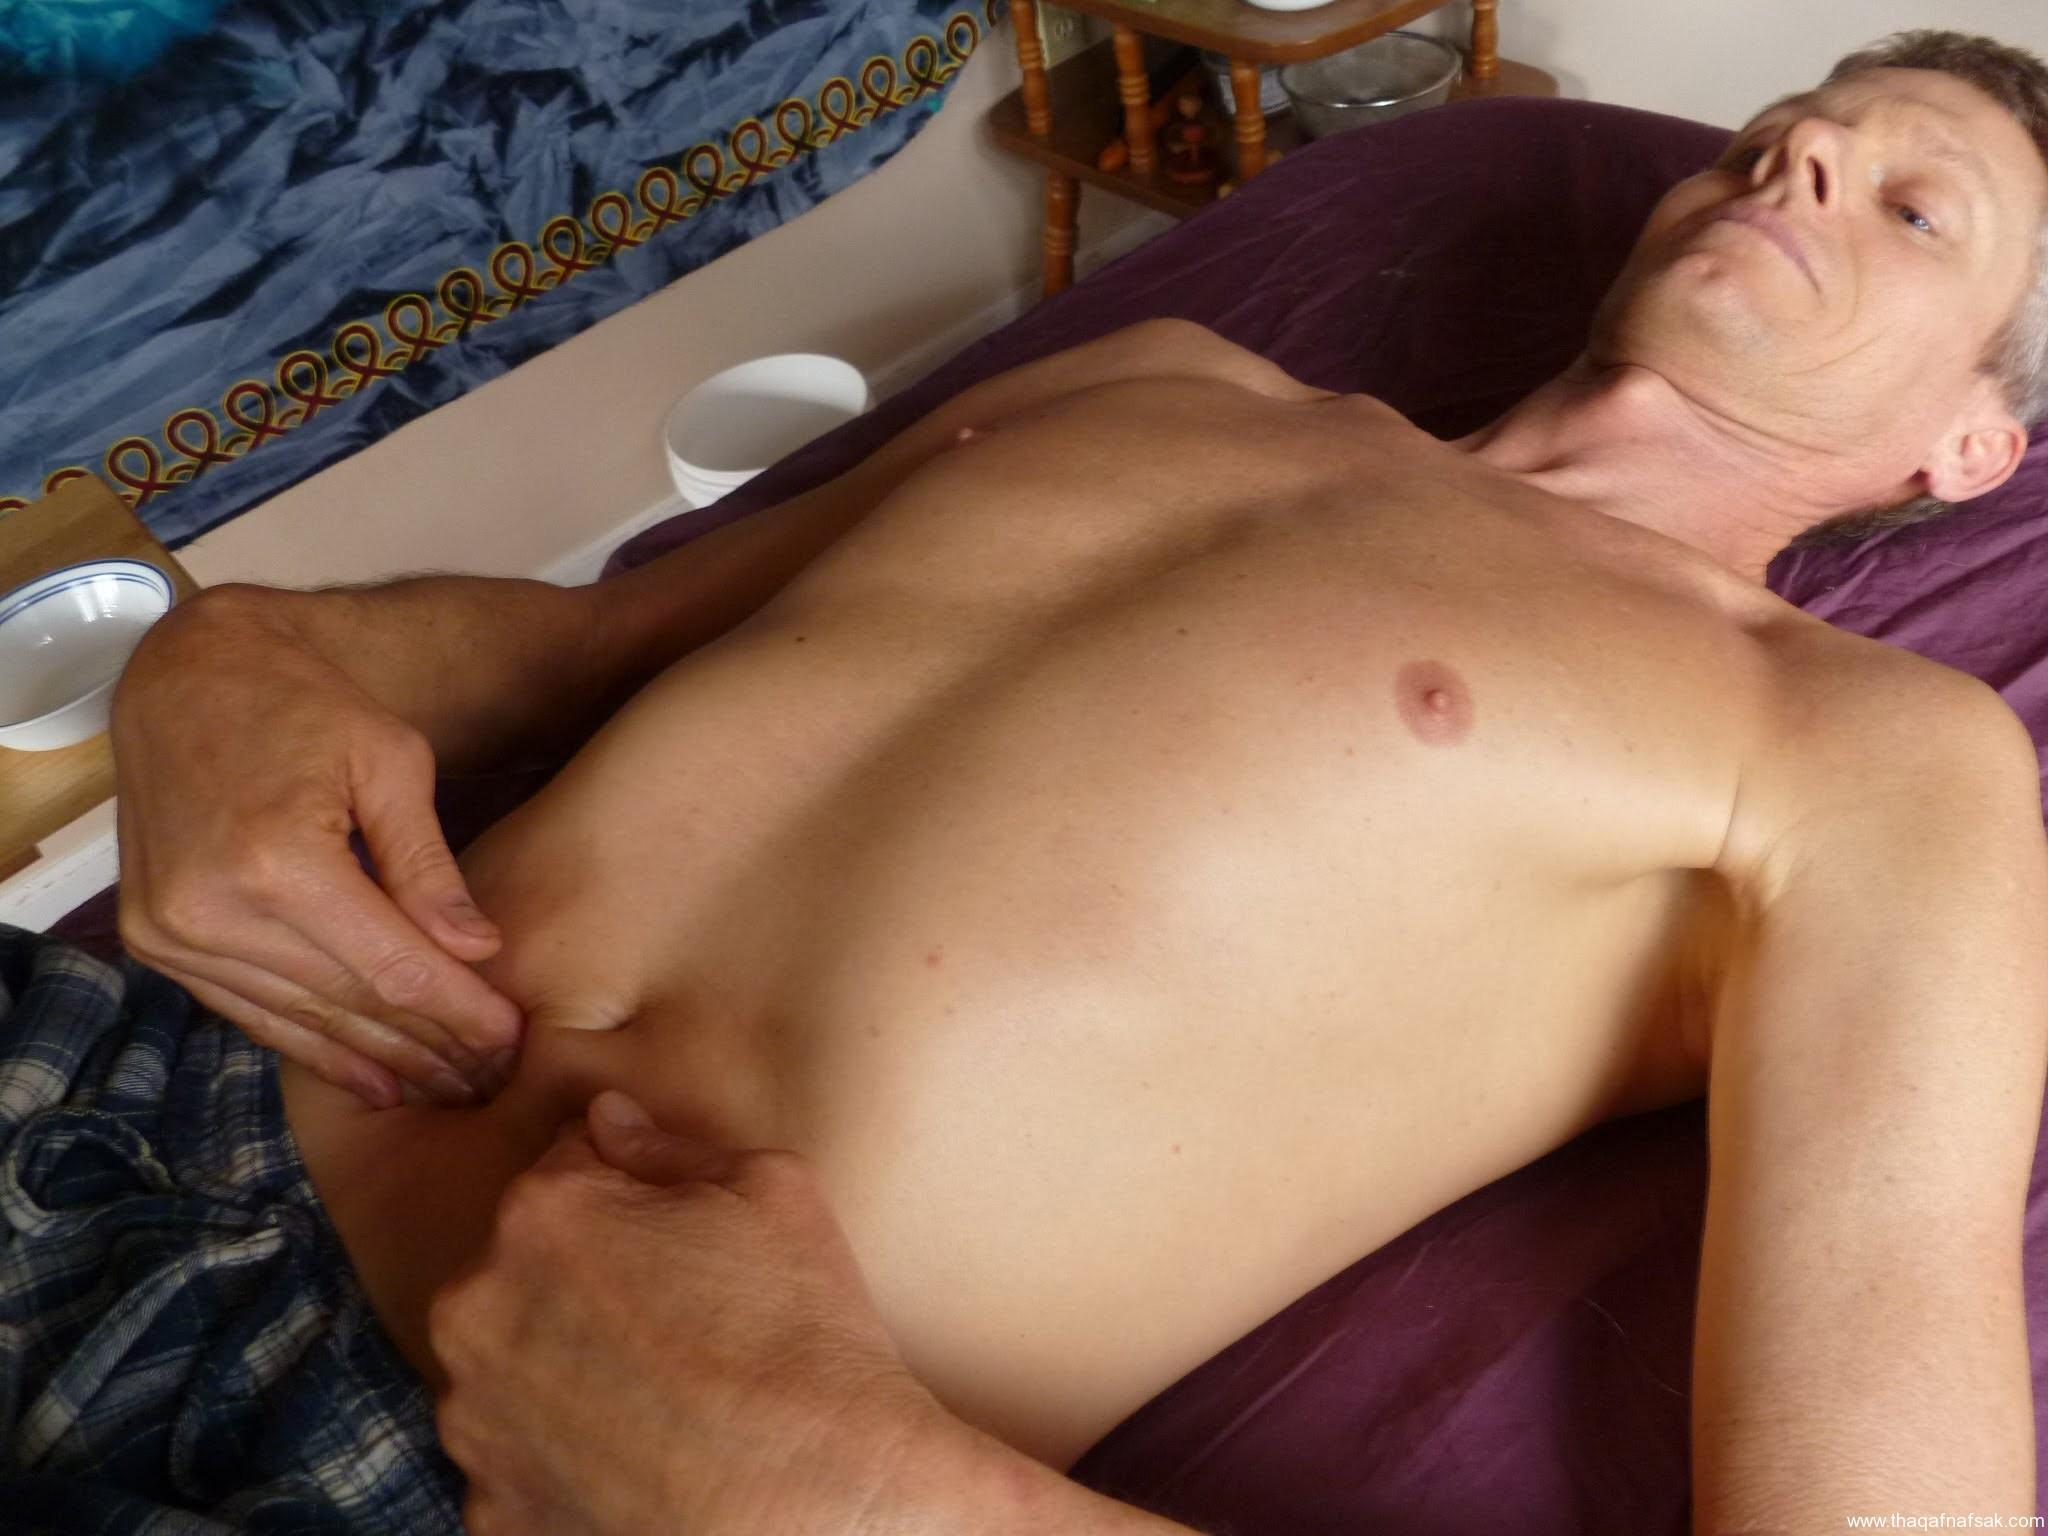 Body Massage - Educate Yourself 8